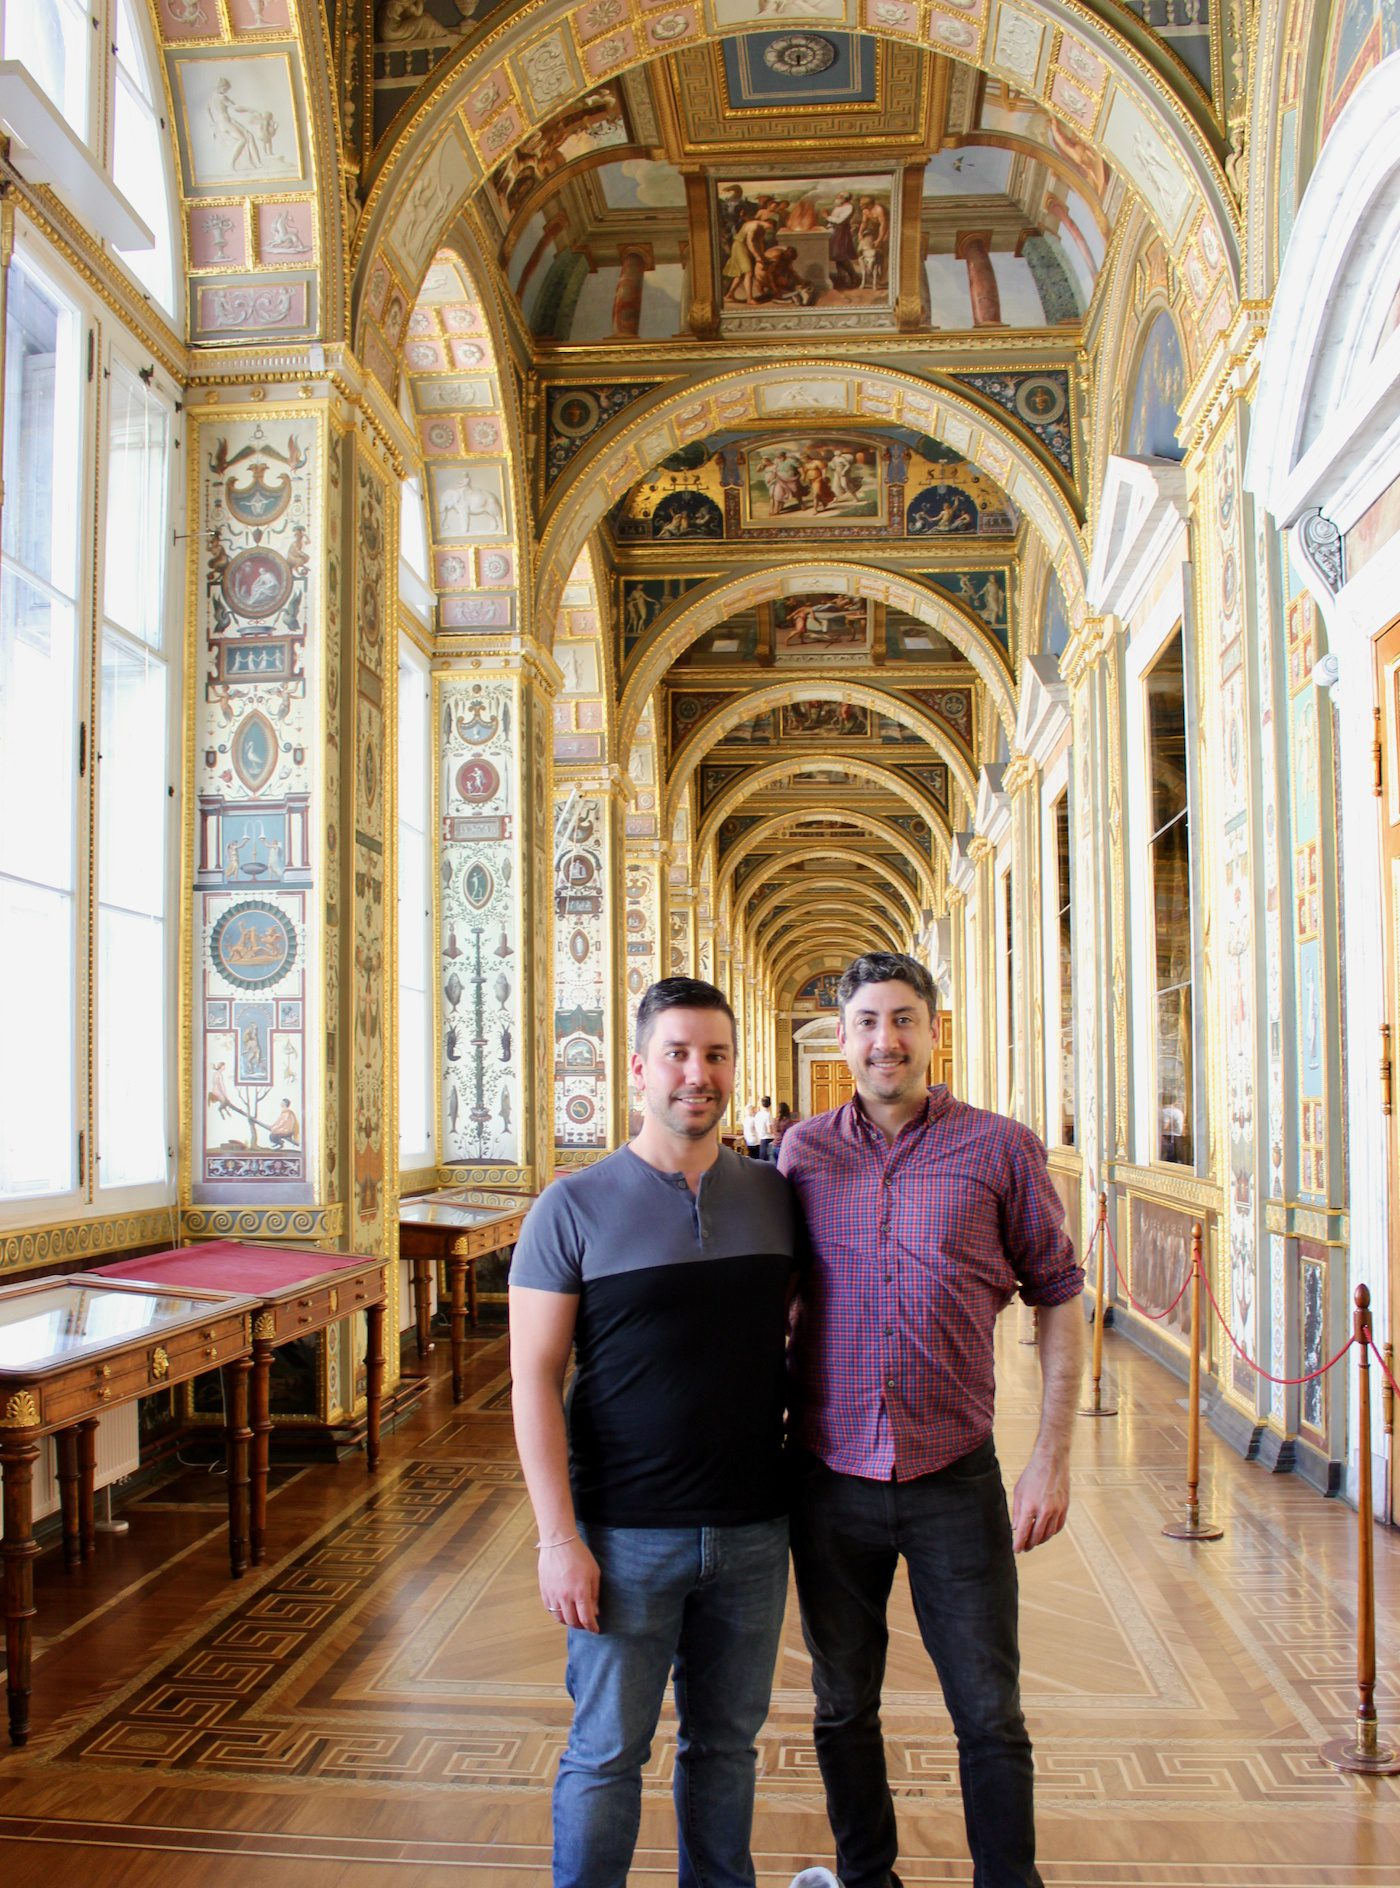 Visiting The Hermitage in Saint Petersburg, Russia